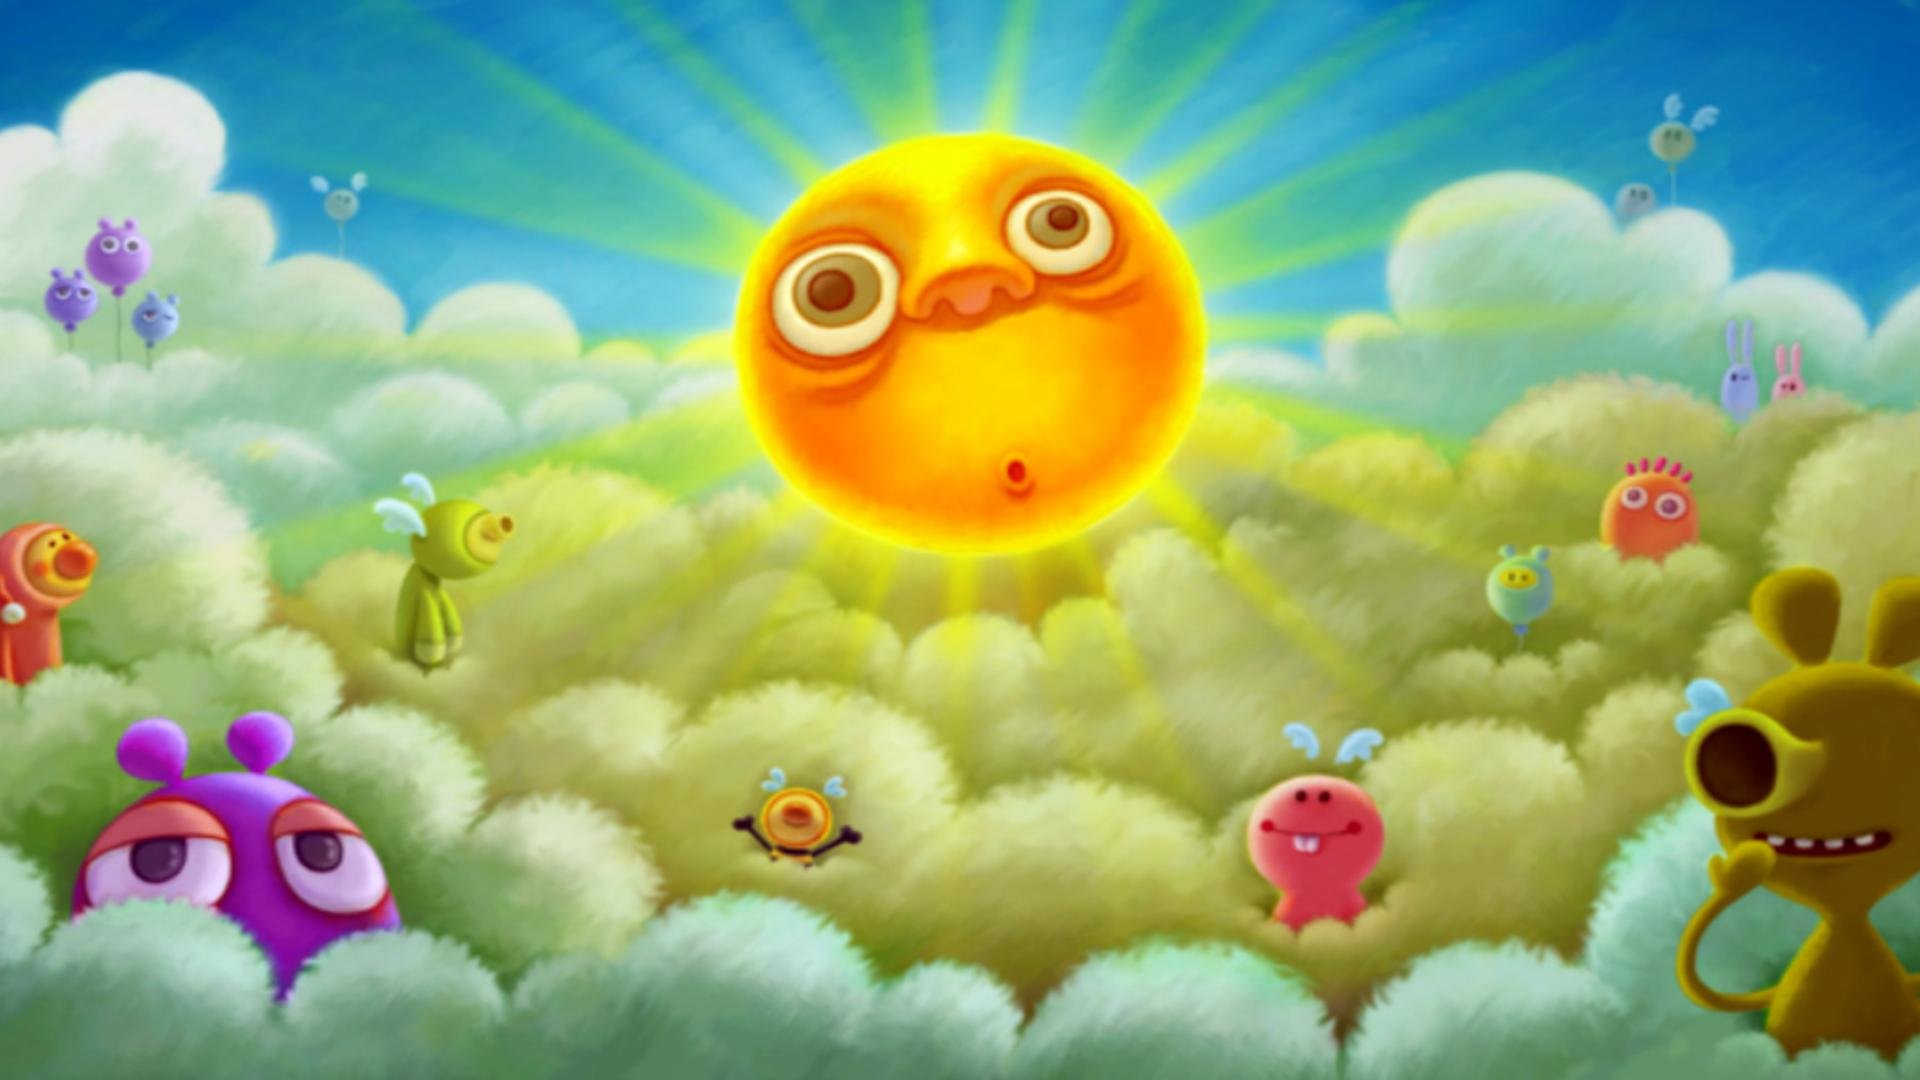 Top Ideas About Cartoon Wallpaper On Pinterest Adventure Time 1920x1080